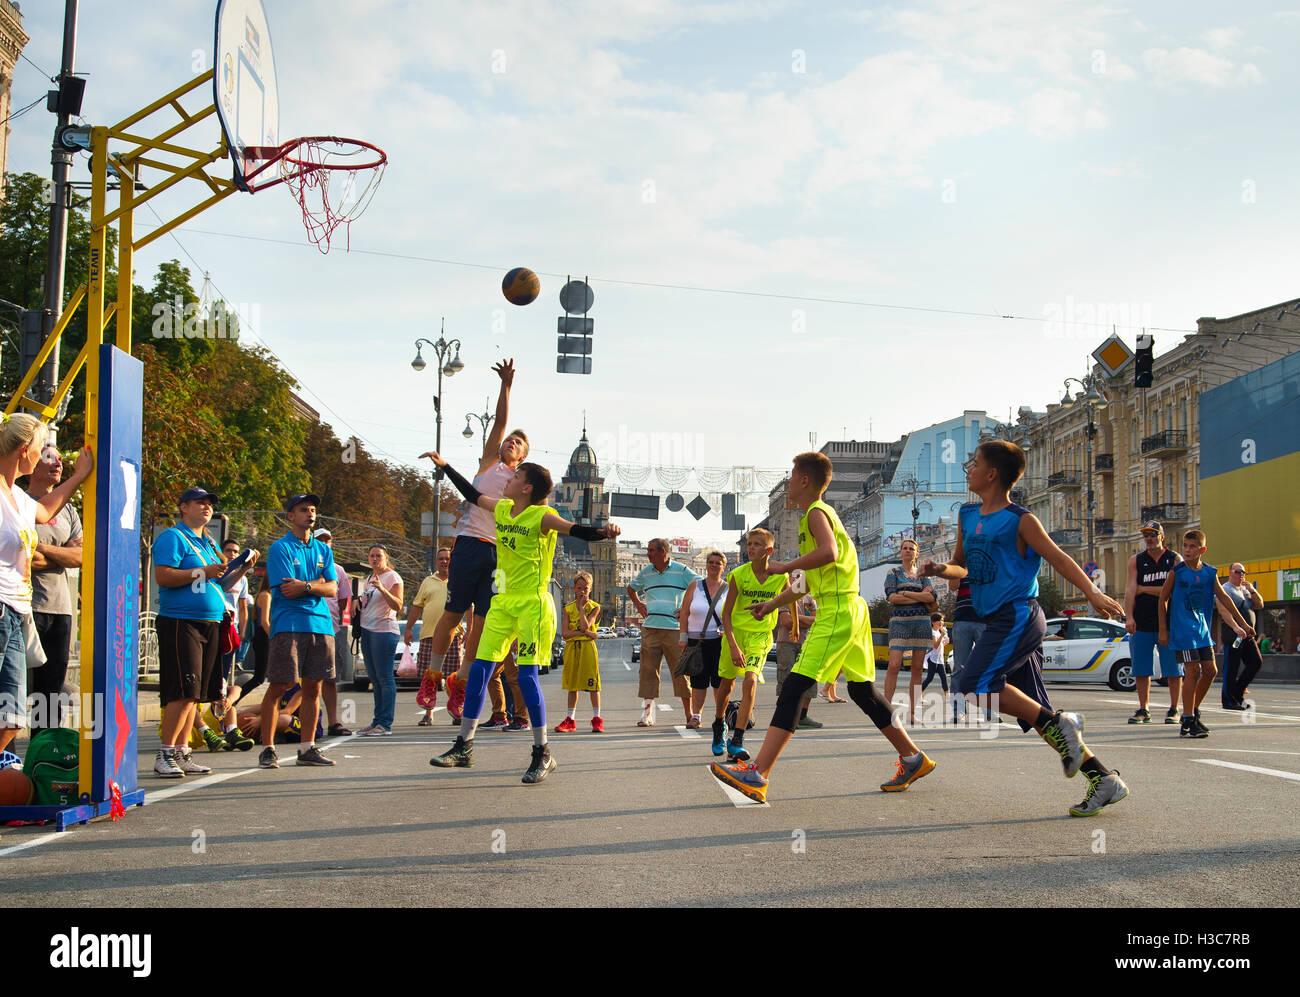 Adolescents jouant au basket-ball pendant le 3x3 Streetball ukrainien championnat. Photo Stock